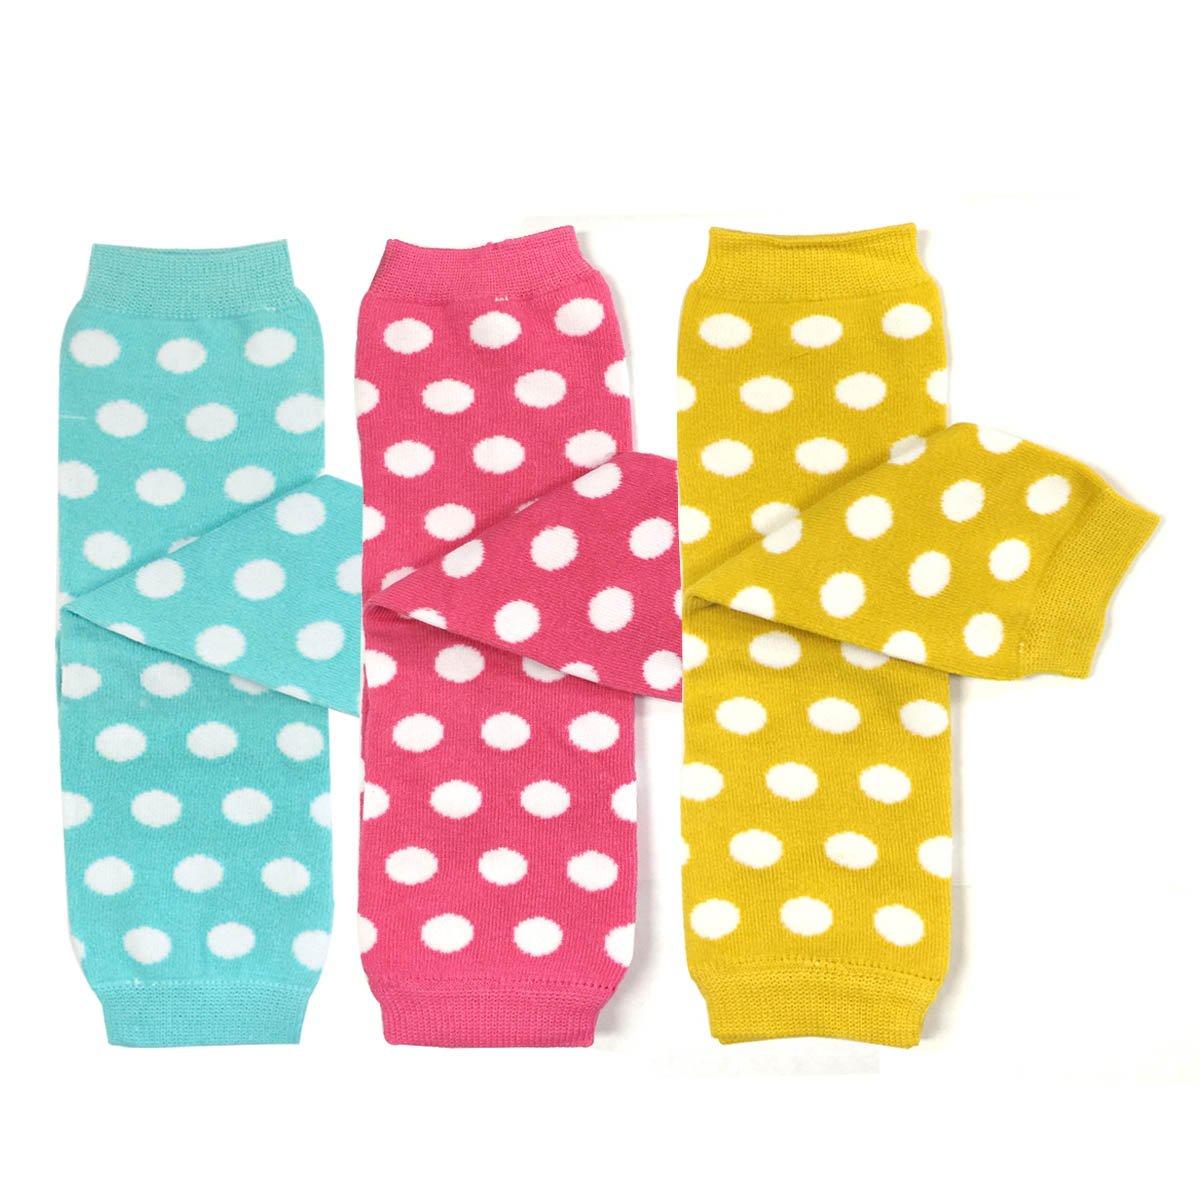 Bowbear Baby 3-Pair Colorful Leg Warmers Dots in Aqua Pink Yellow B68807c_AFN